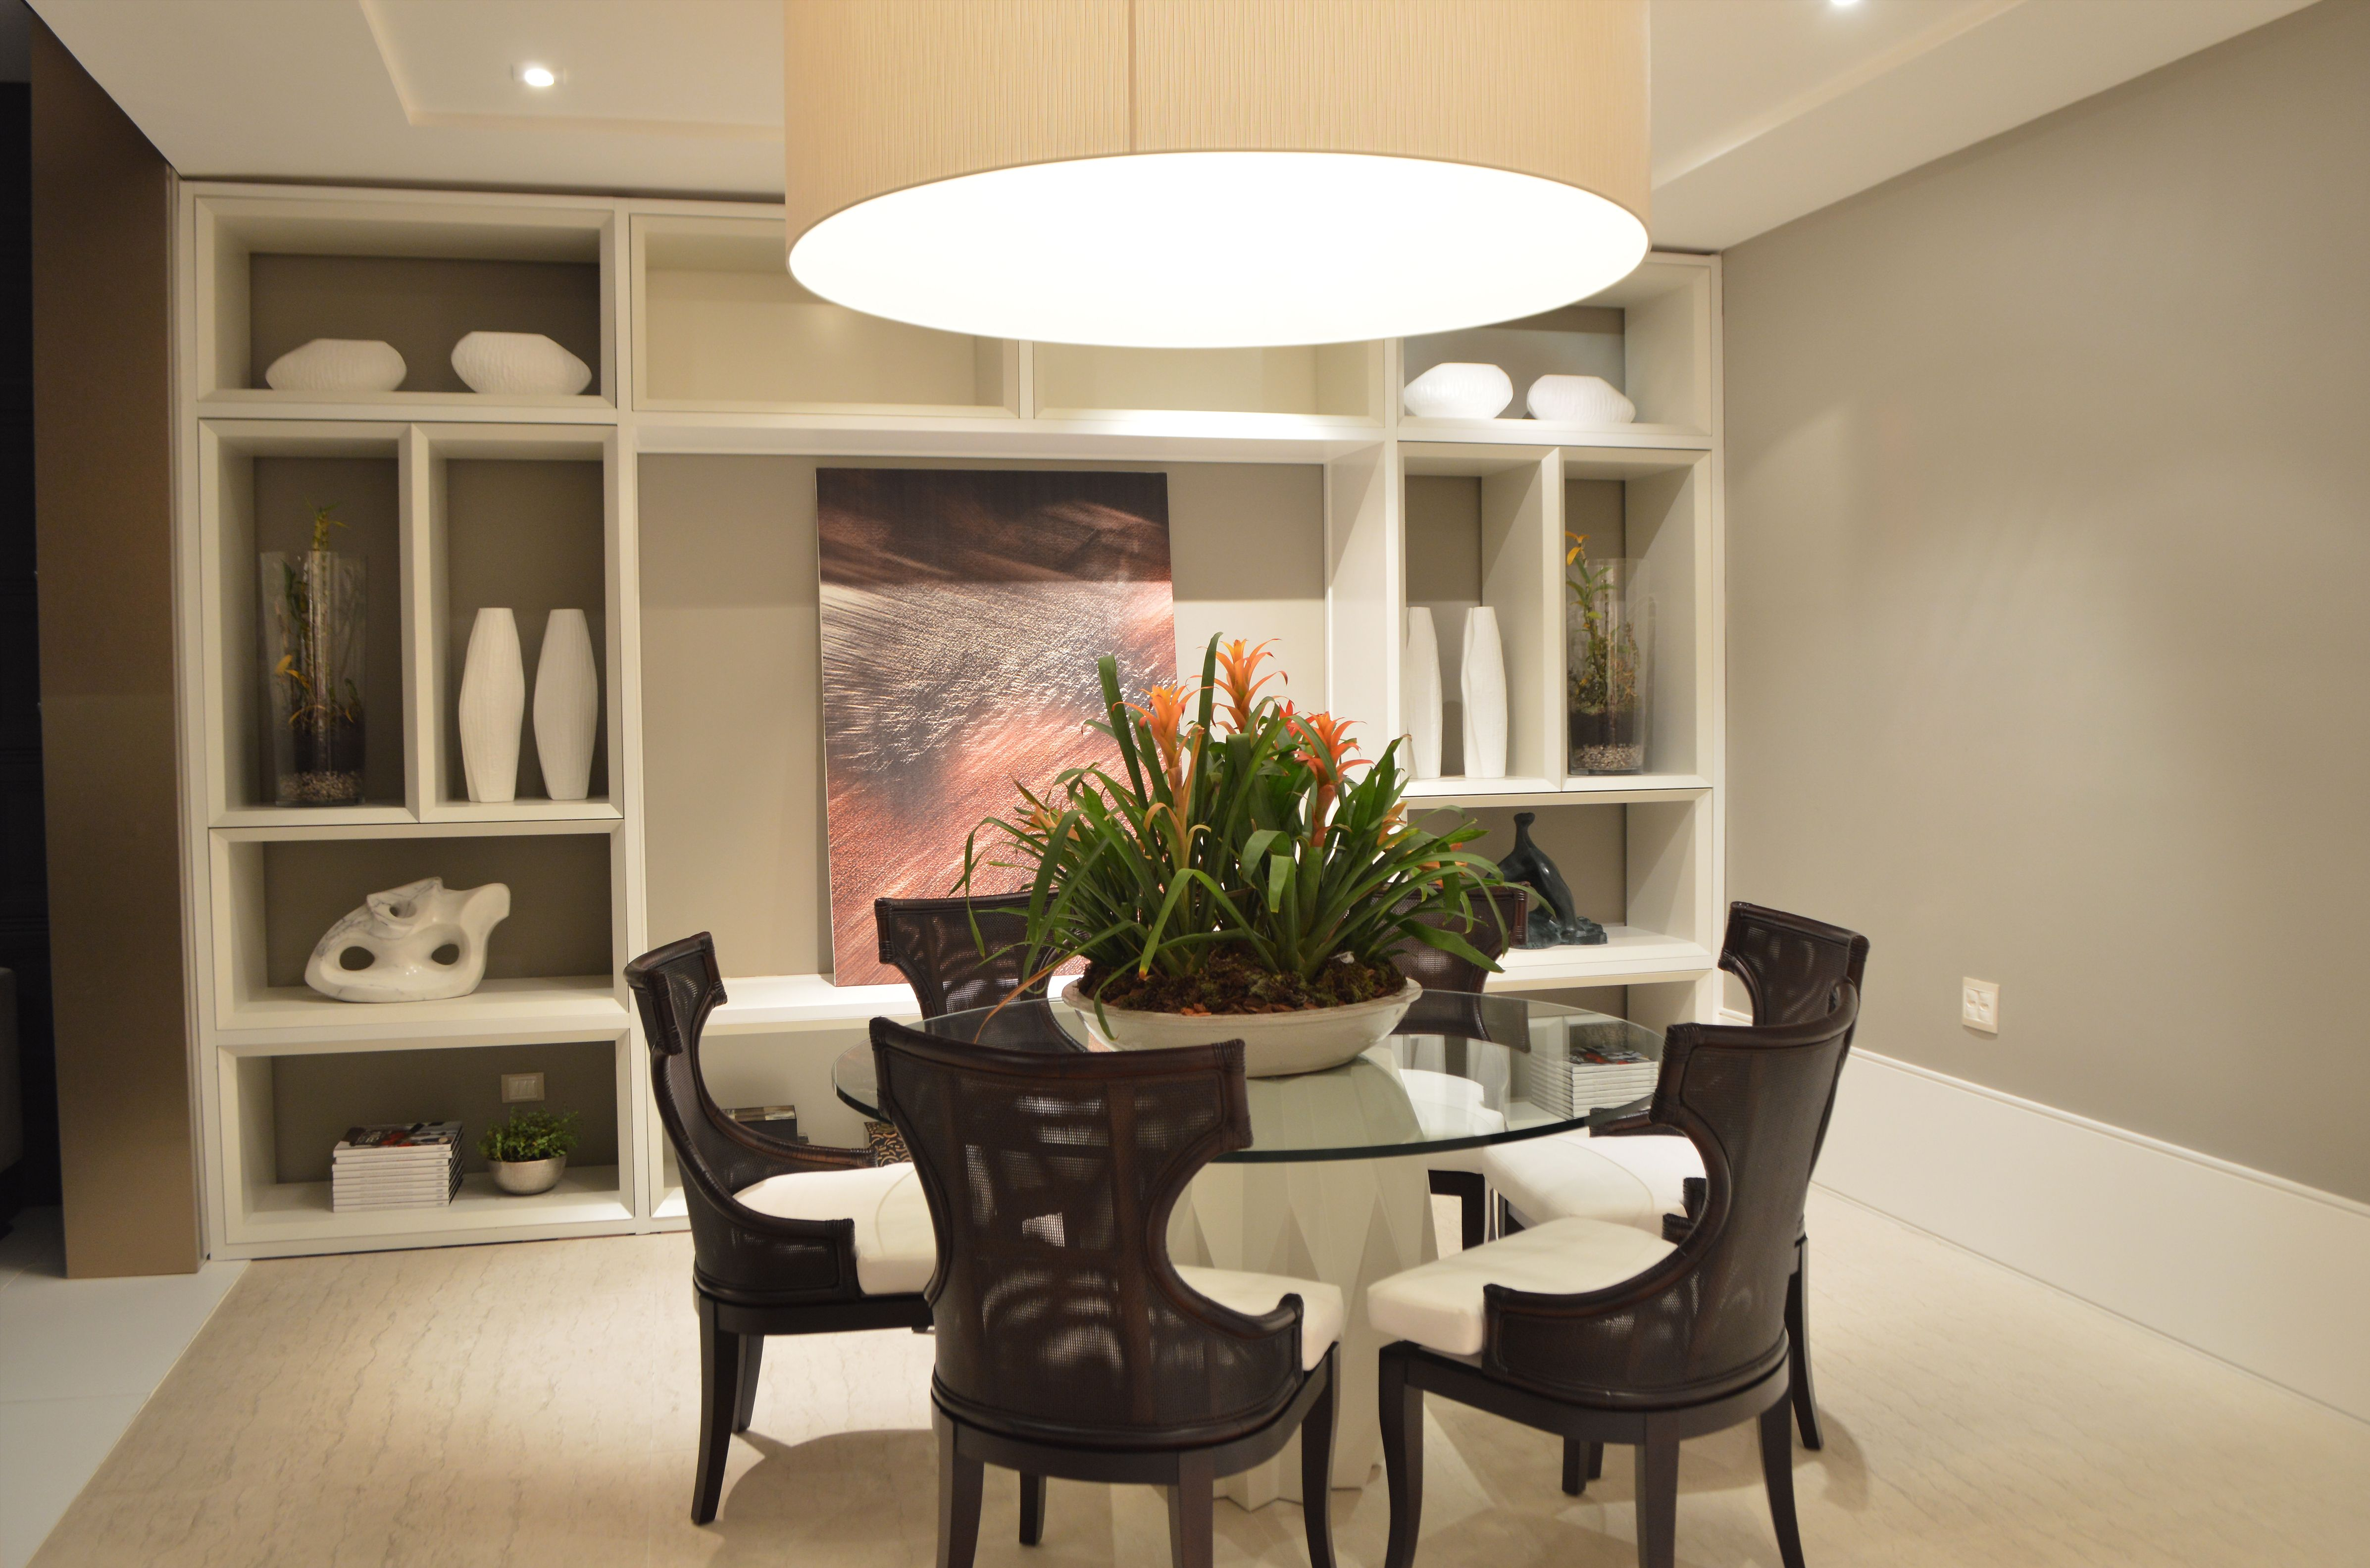 Projeto de patrícia penna foto beto riginik sala de jantar